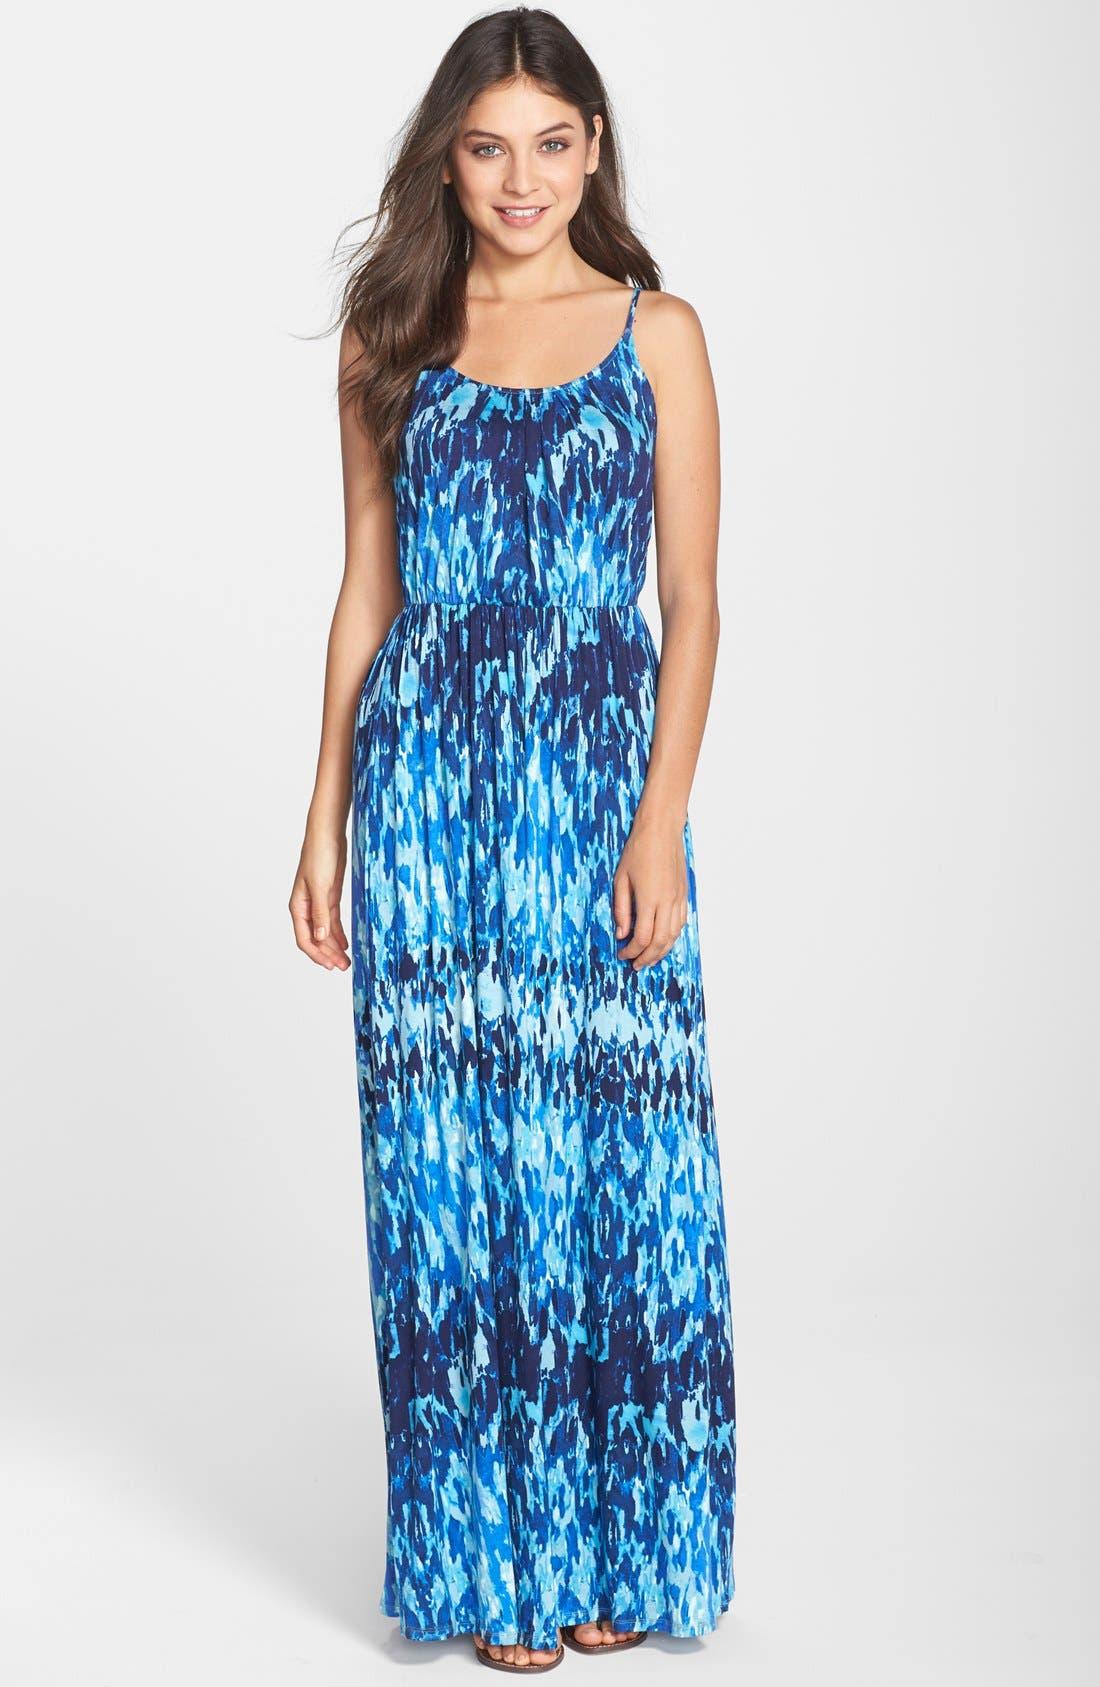 Main Image - Felicity & Coco 'Ezri' Print Maxi Dress (Regular & Petite) (Nordstrom Exclusive)